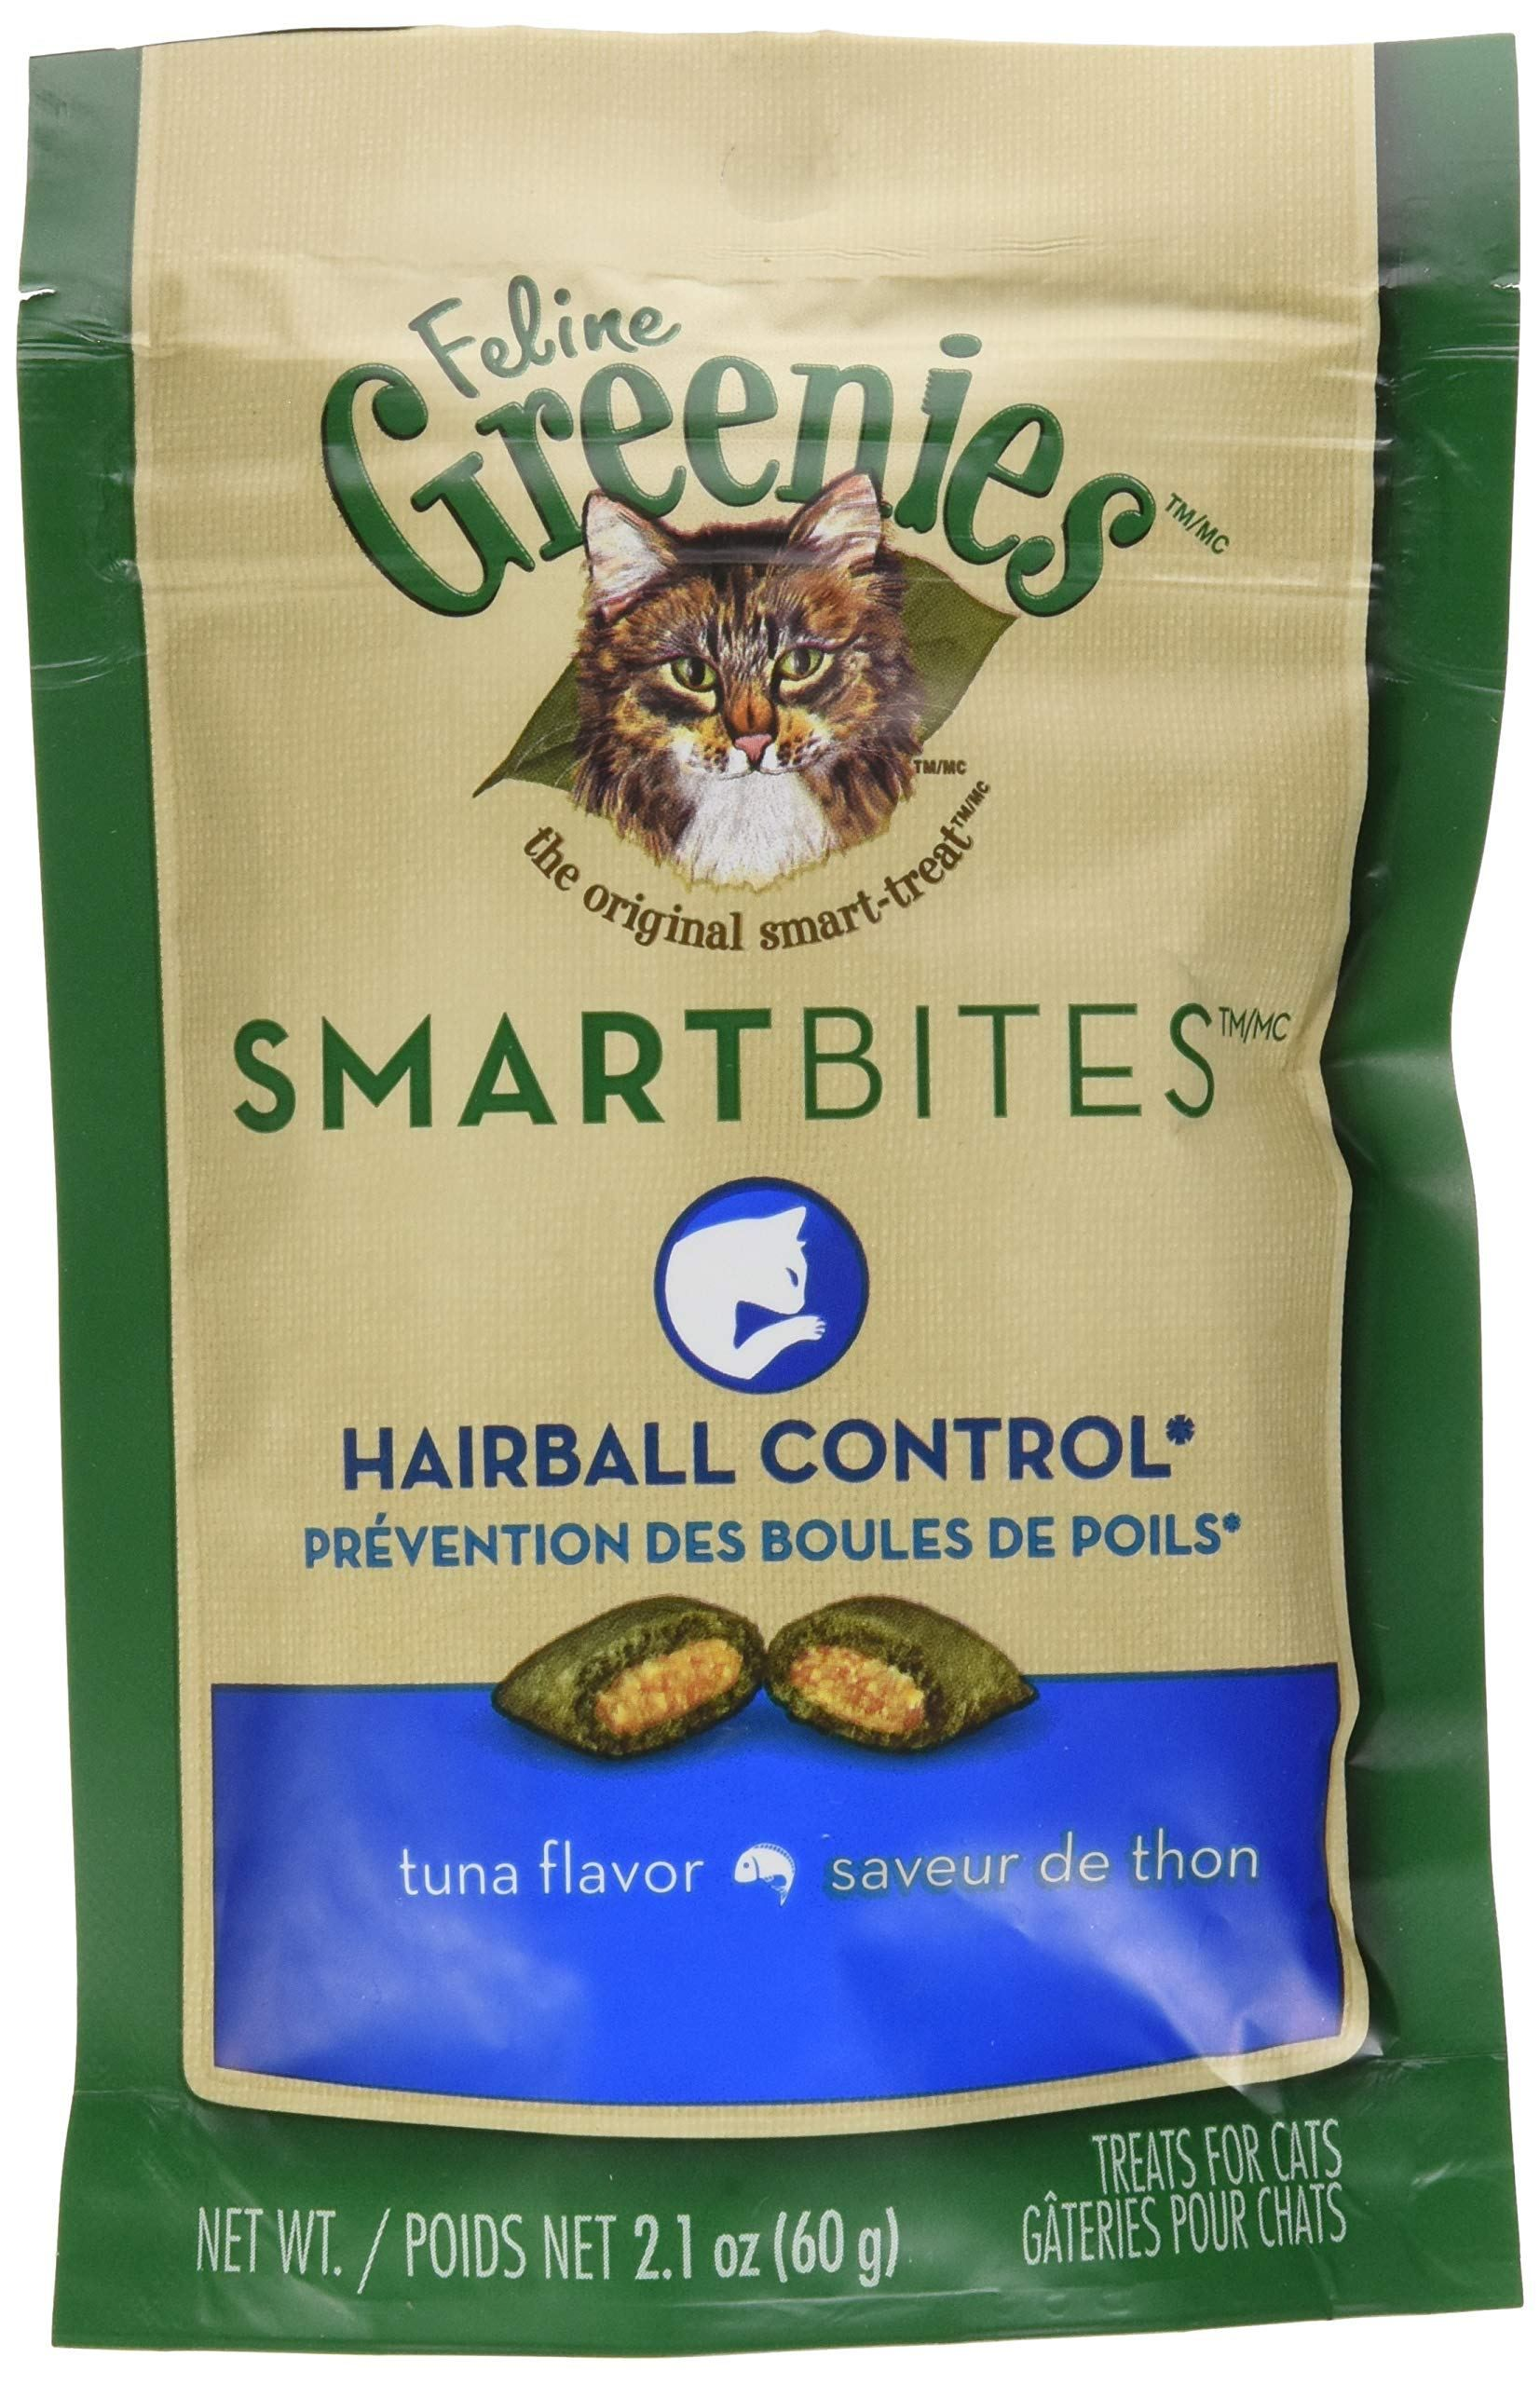 FELINE GREENIES SMARTBITES Cat Treats Greenies, Cat